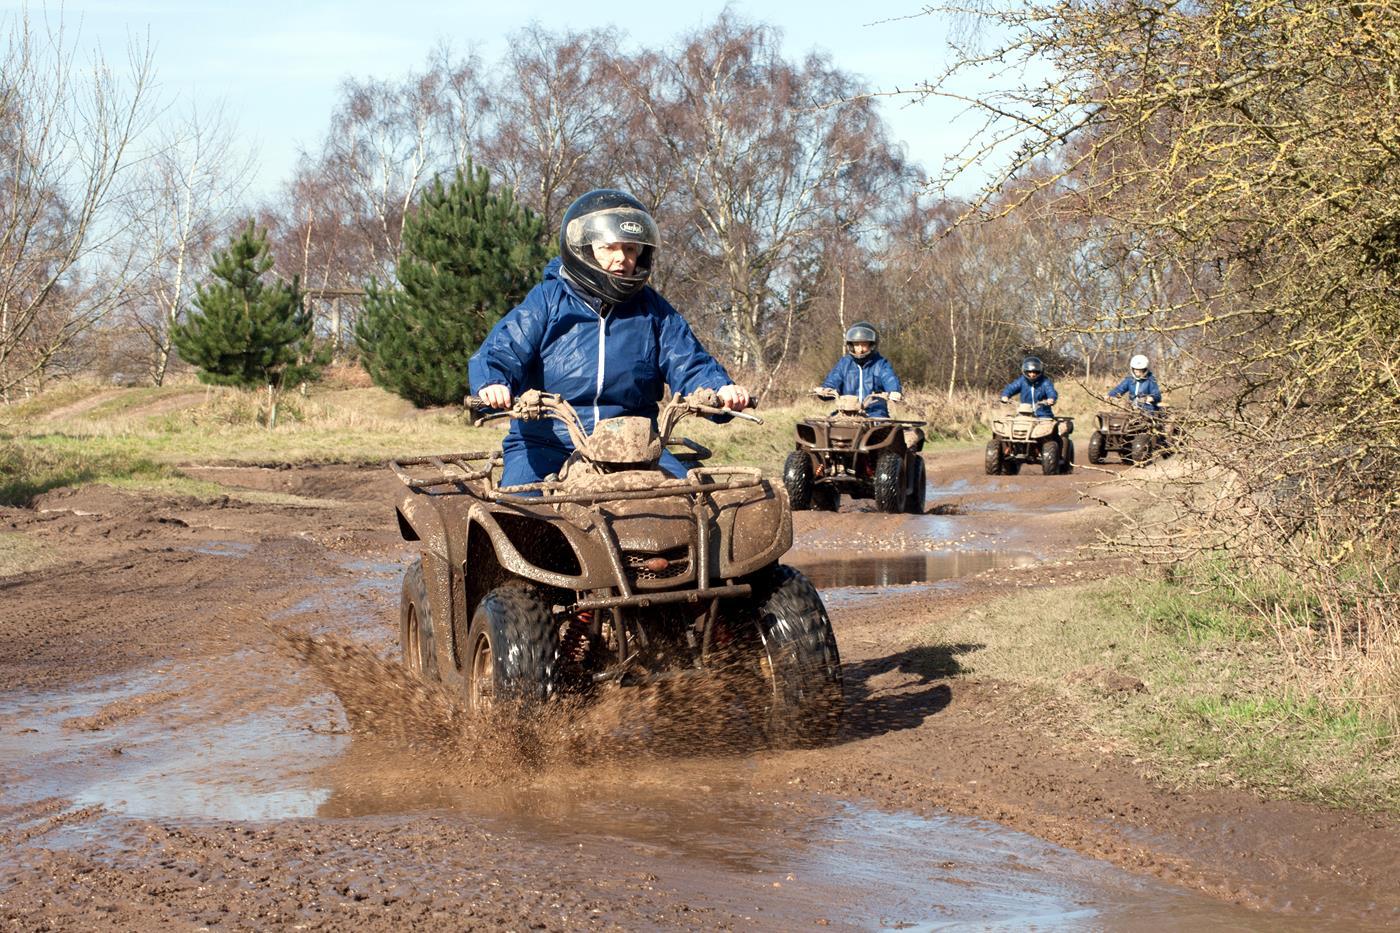 quad biking through mud